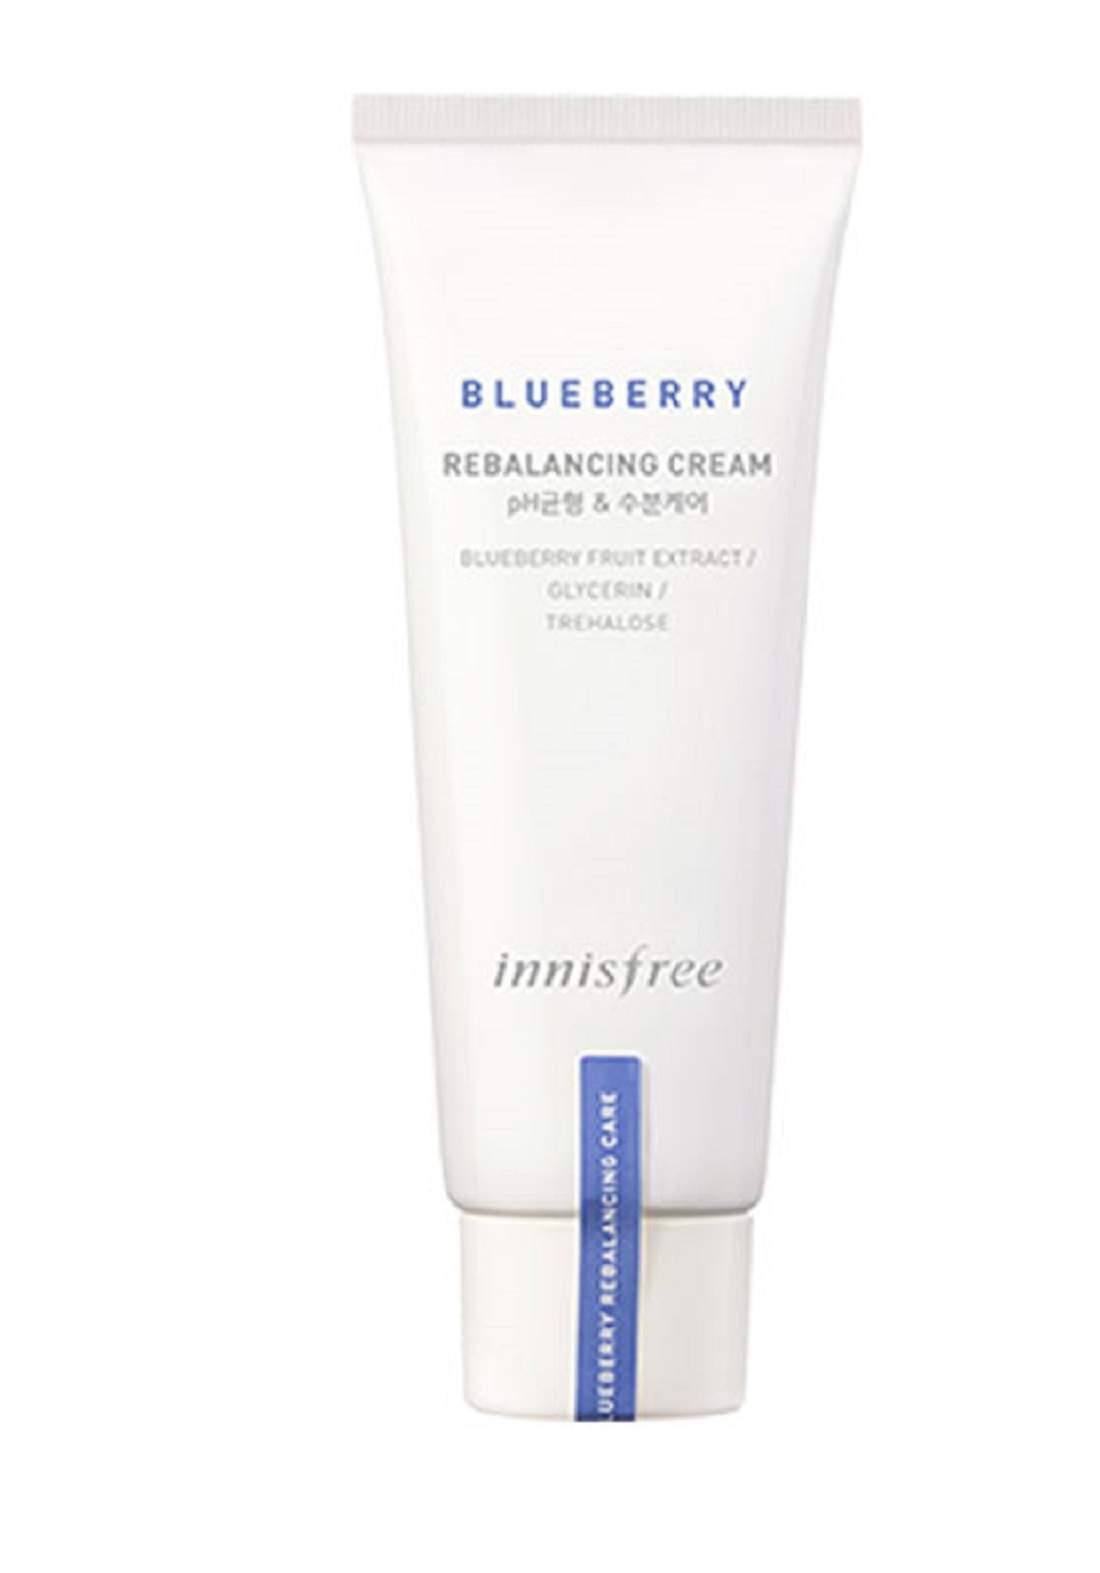 Innisfree Blueberry Cream  كريم مرطب